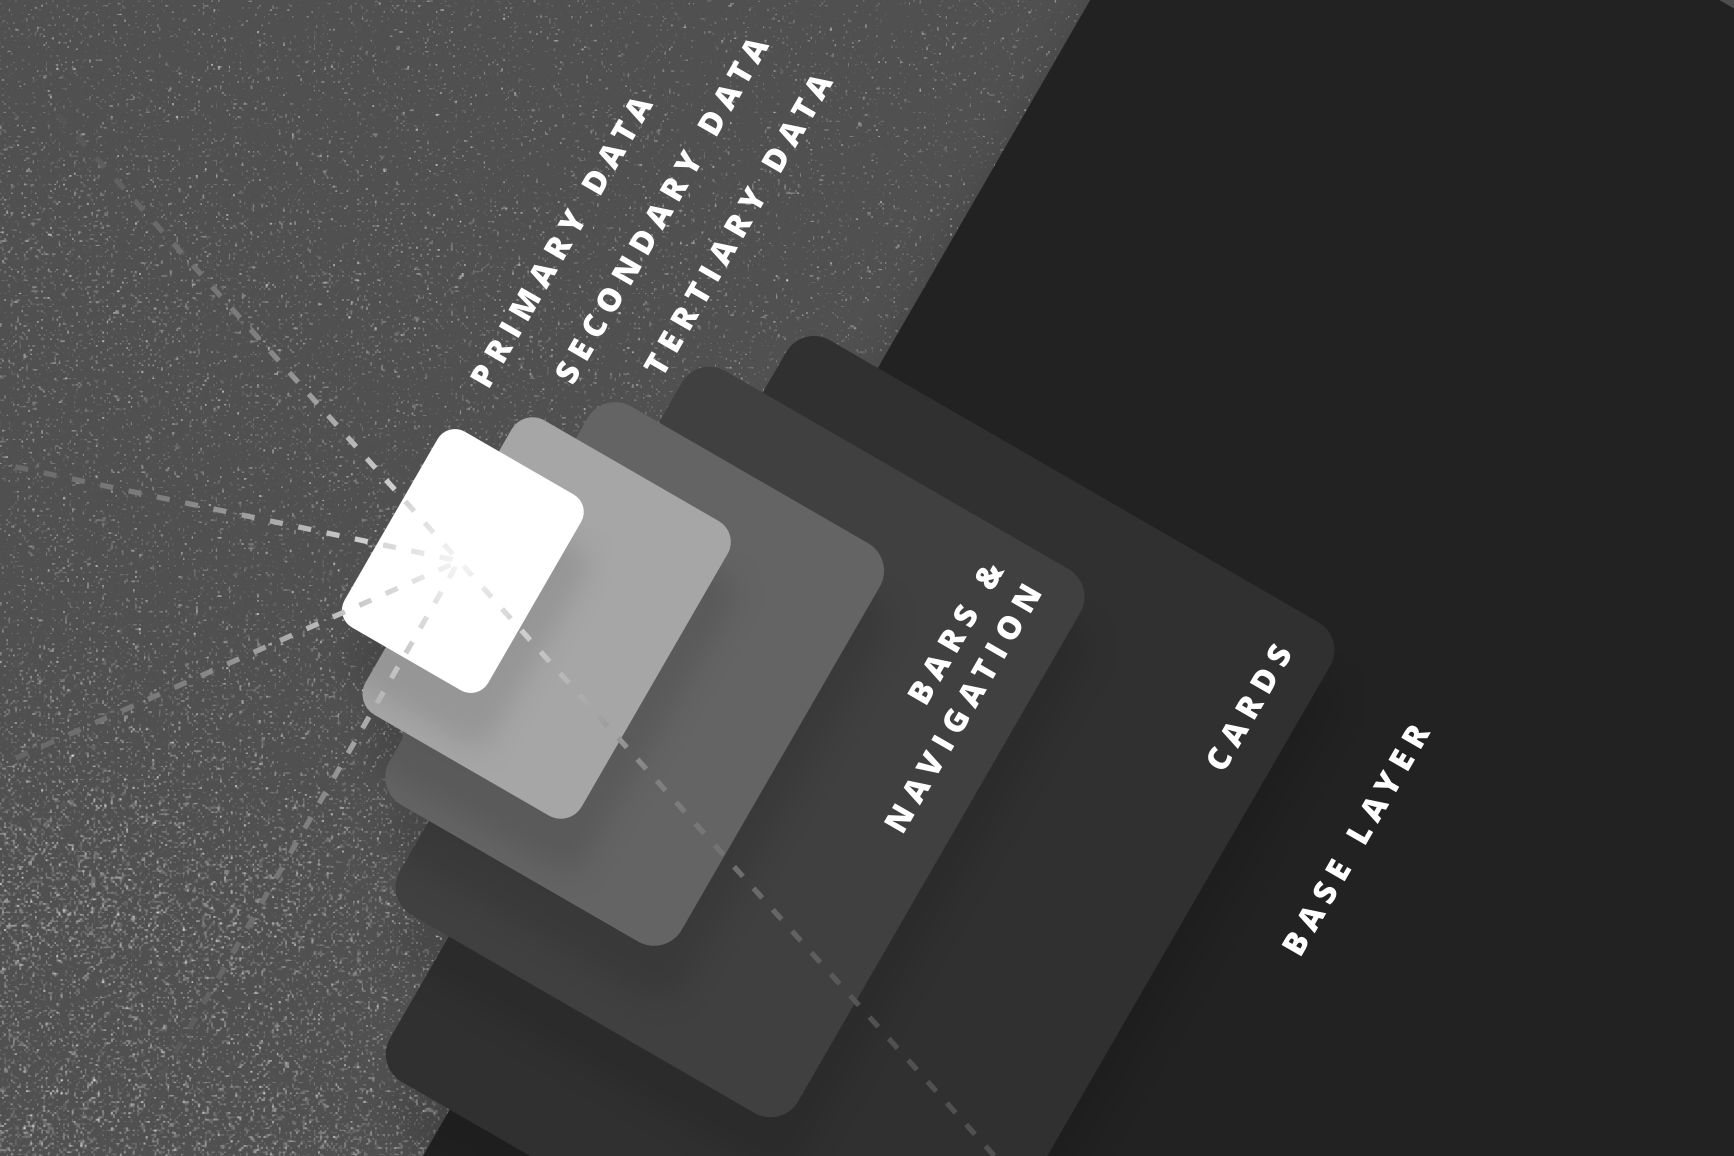 wetter.com dark mode design - layer